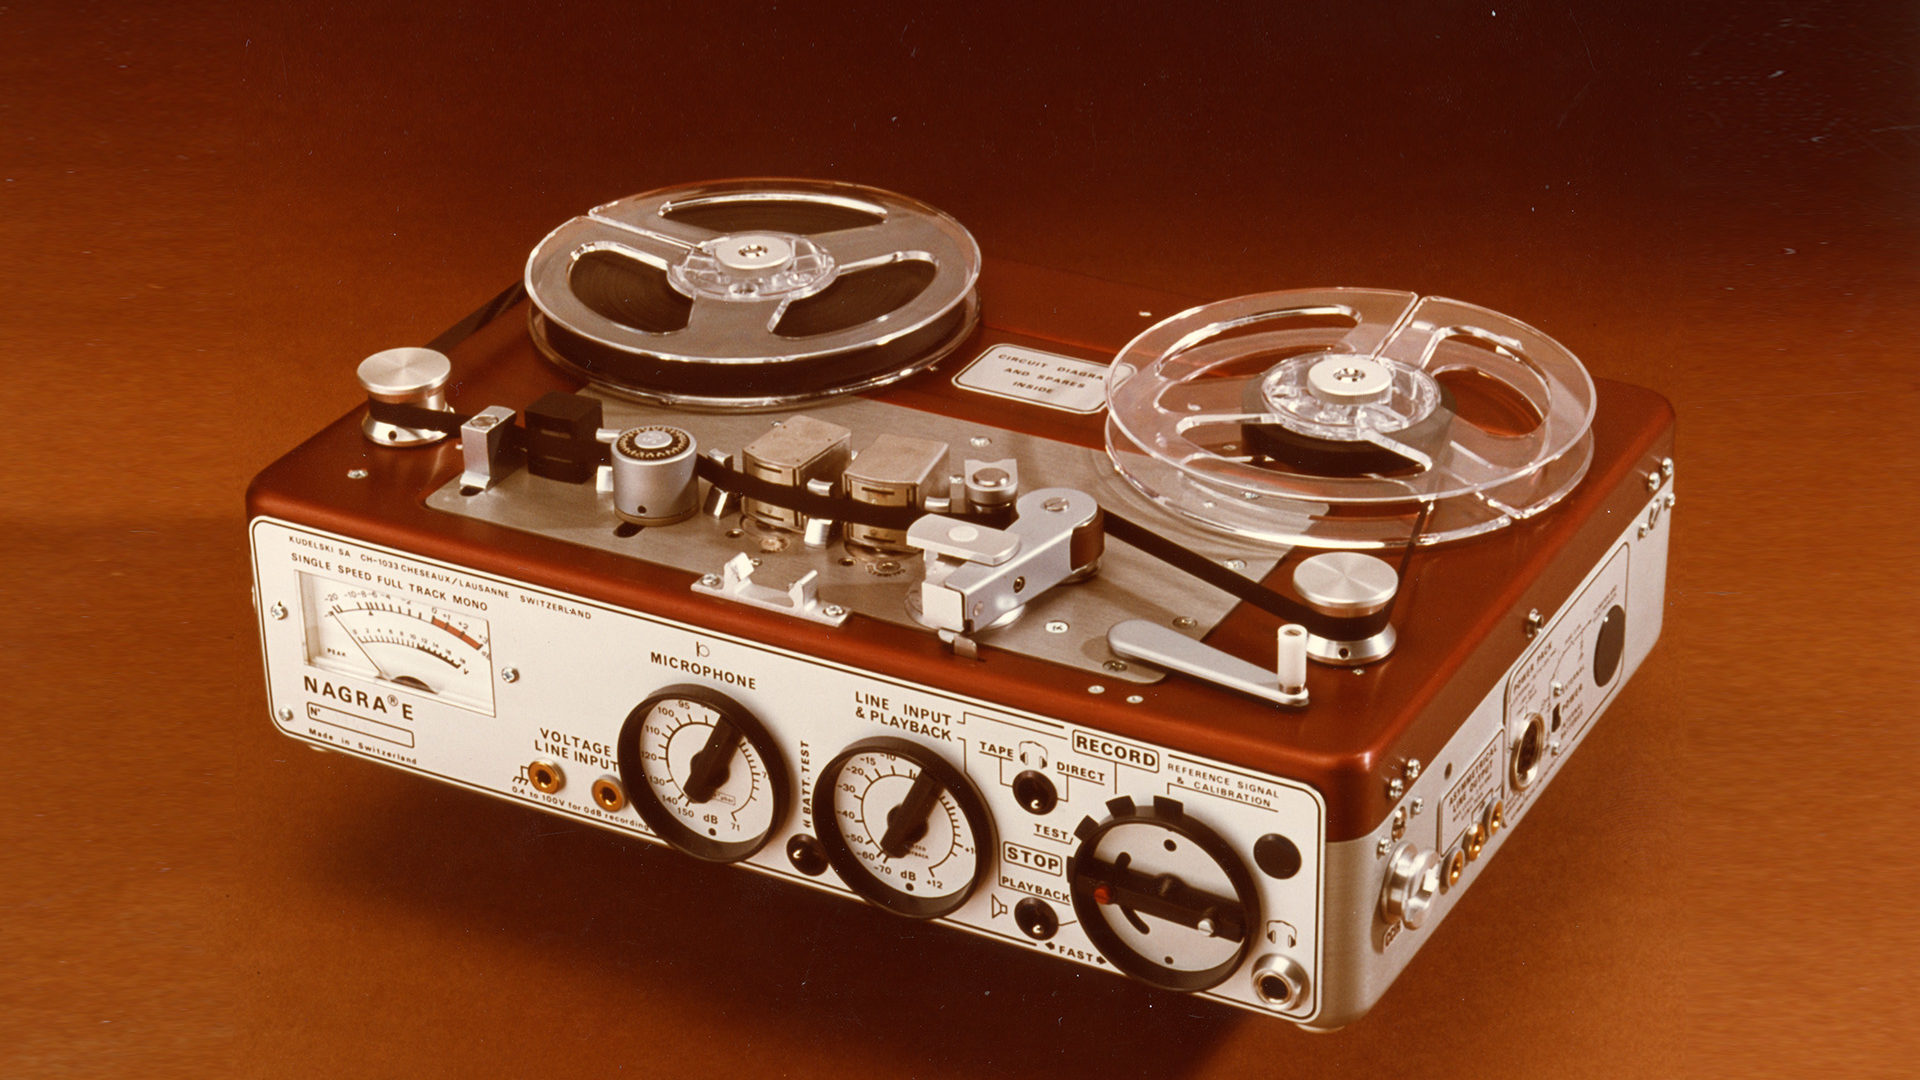 1976 NAGRA E-Economy portable mono full track analog audio tape recorder radio reporters NAB CCIR front